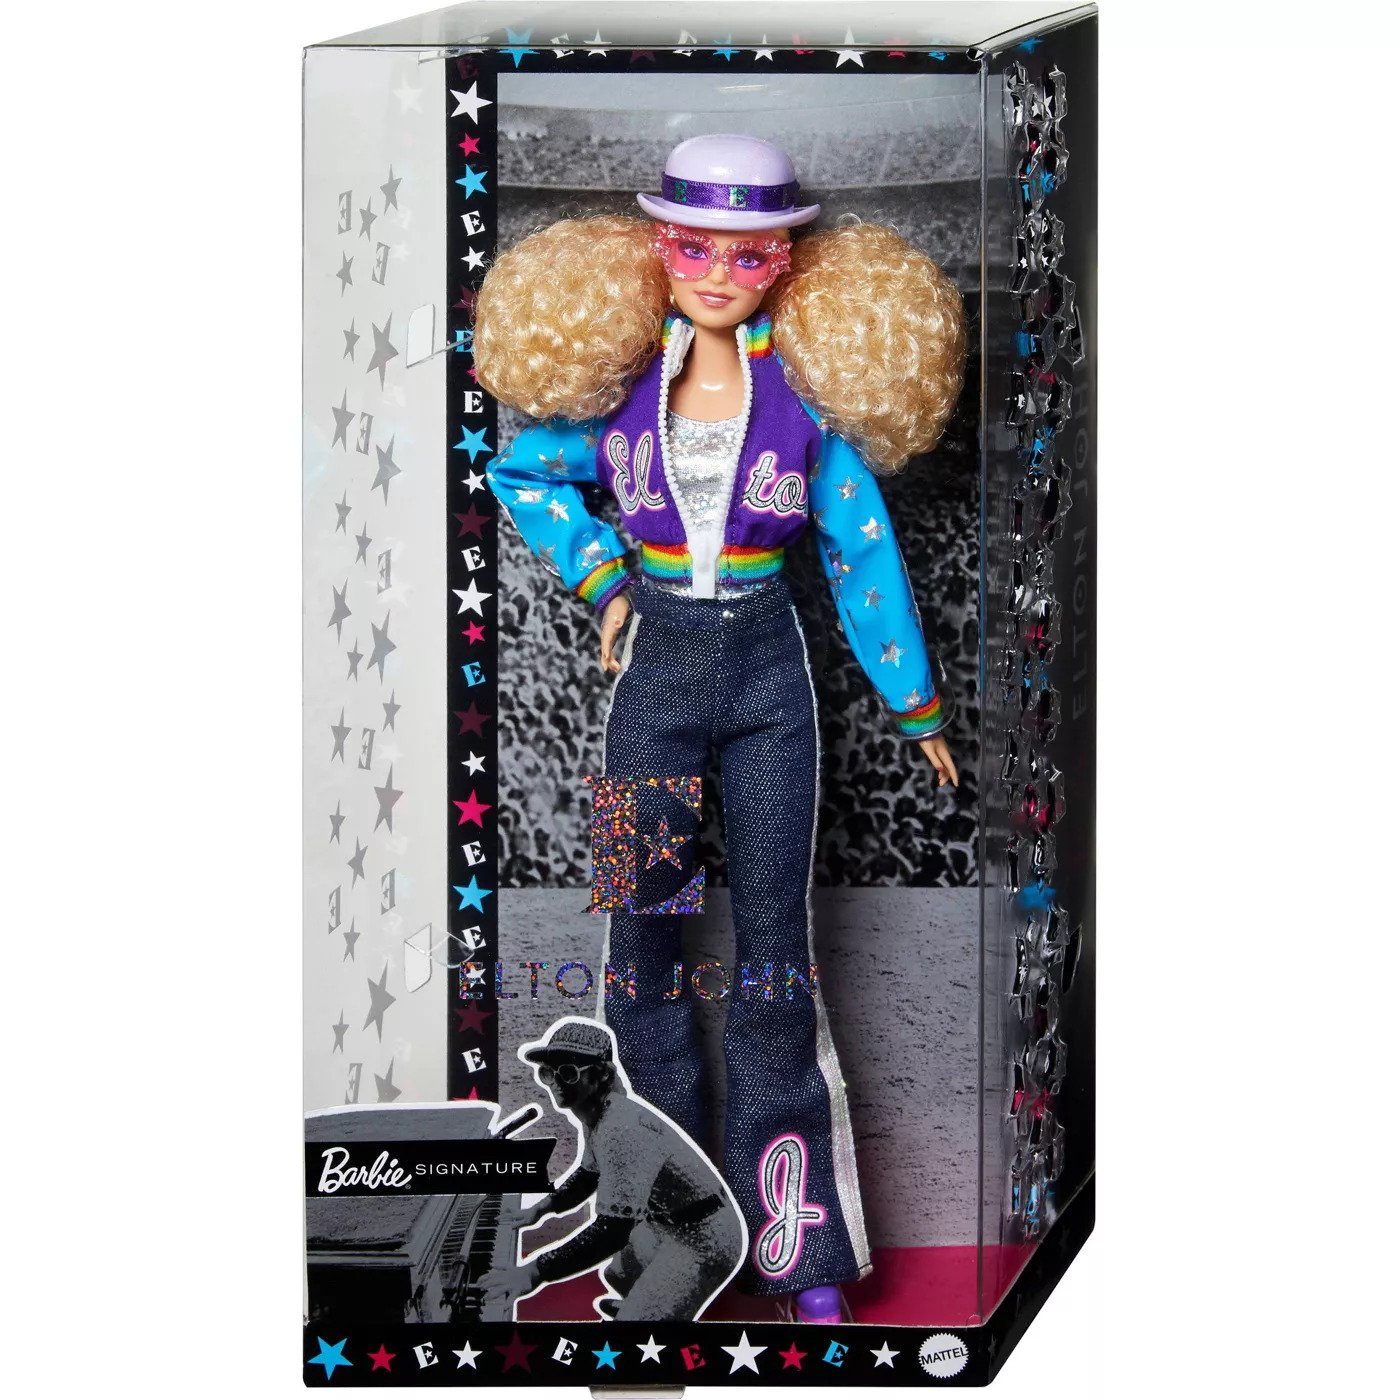 Elton John gets his own Barbie doll 17